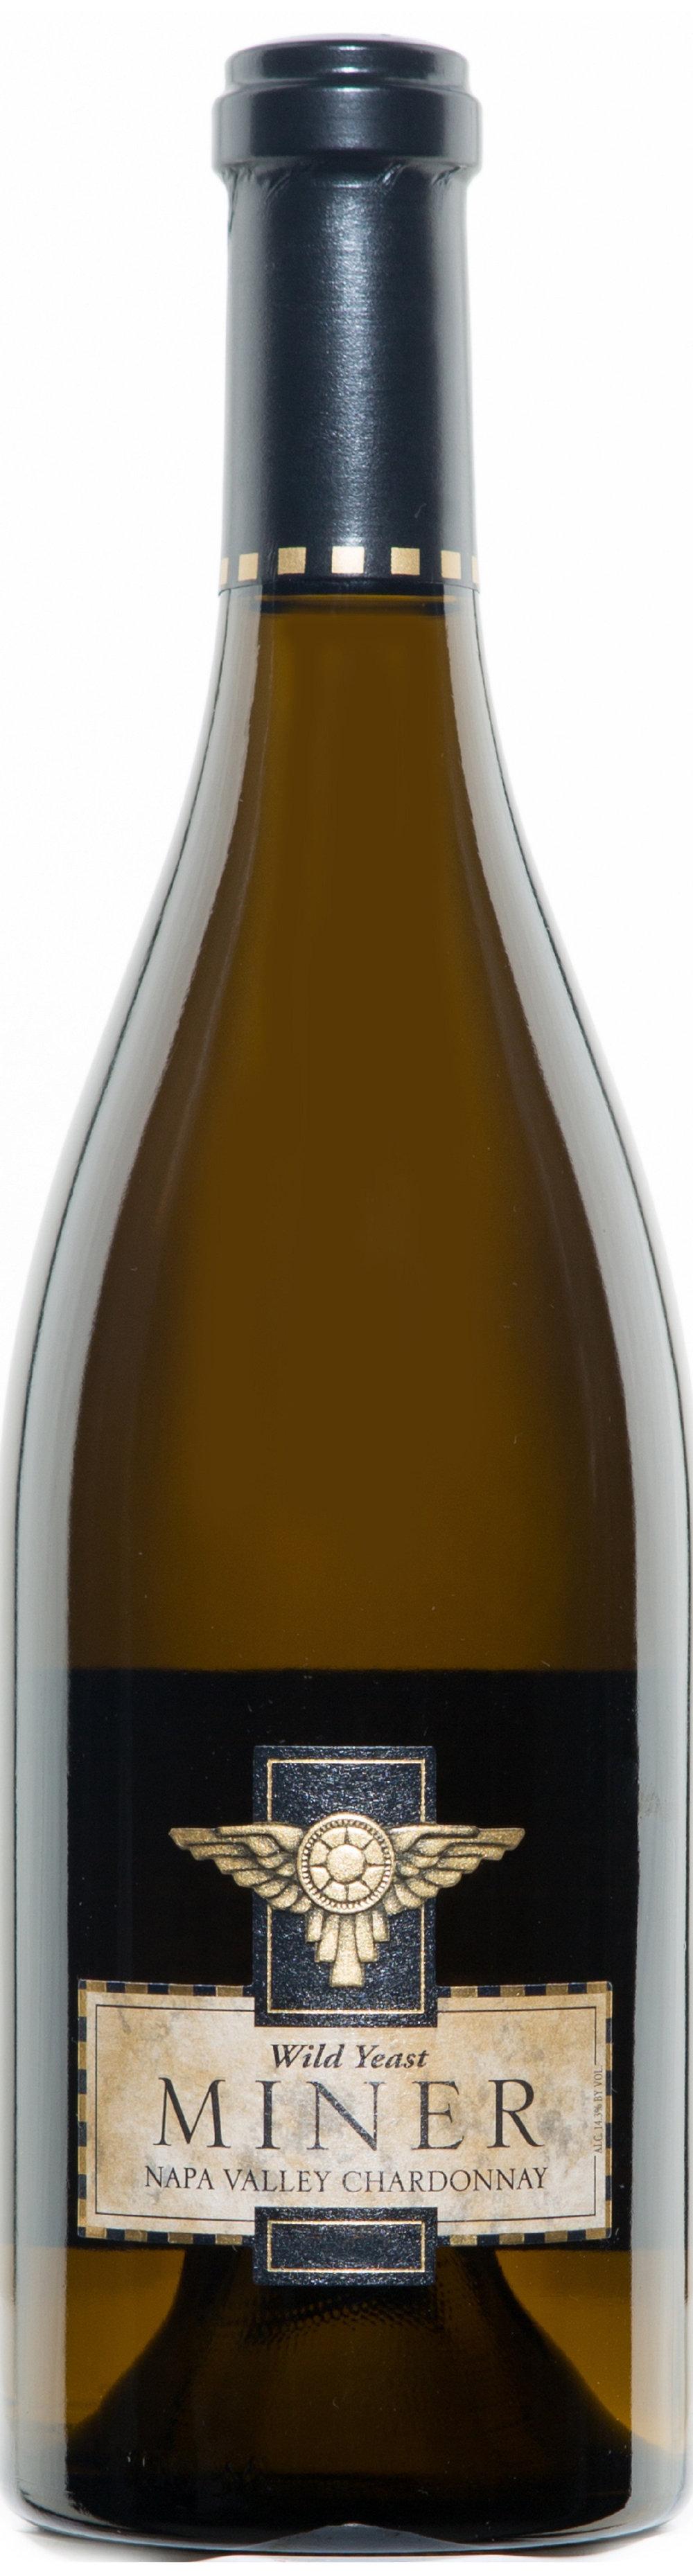 Miner - Wild Yeast Chardonnay 2012, Napa